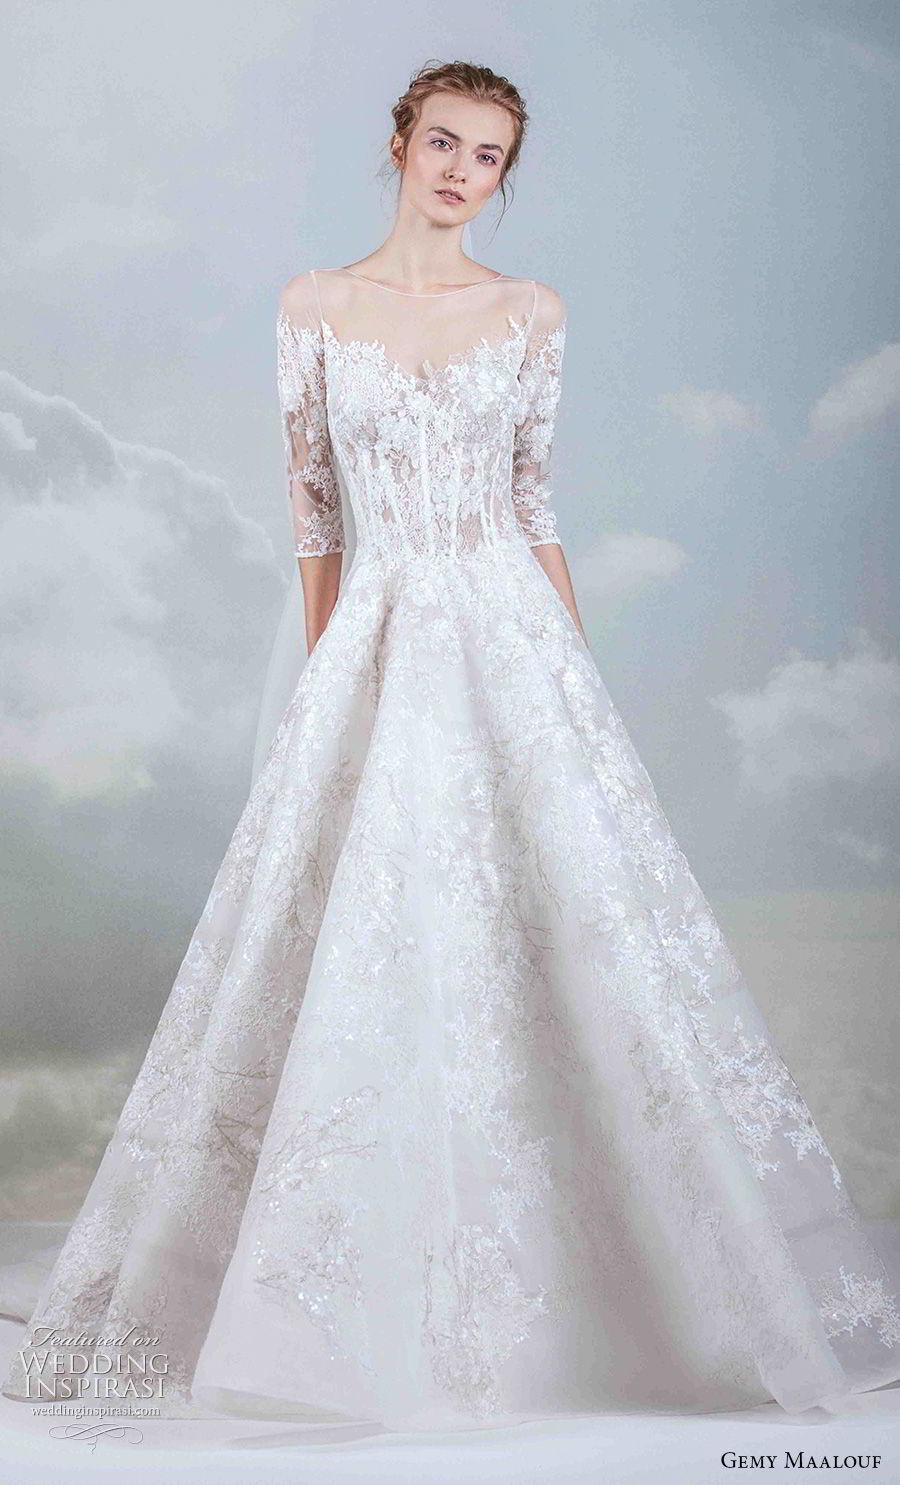 Gemy maalouf 2019 wedding dresses the royal bride A line wedding dress 2019